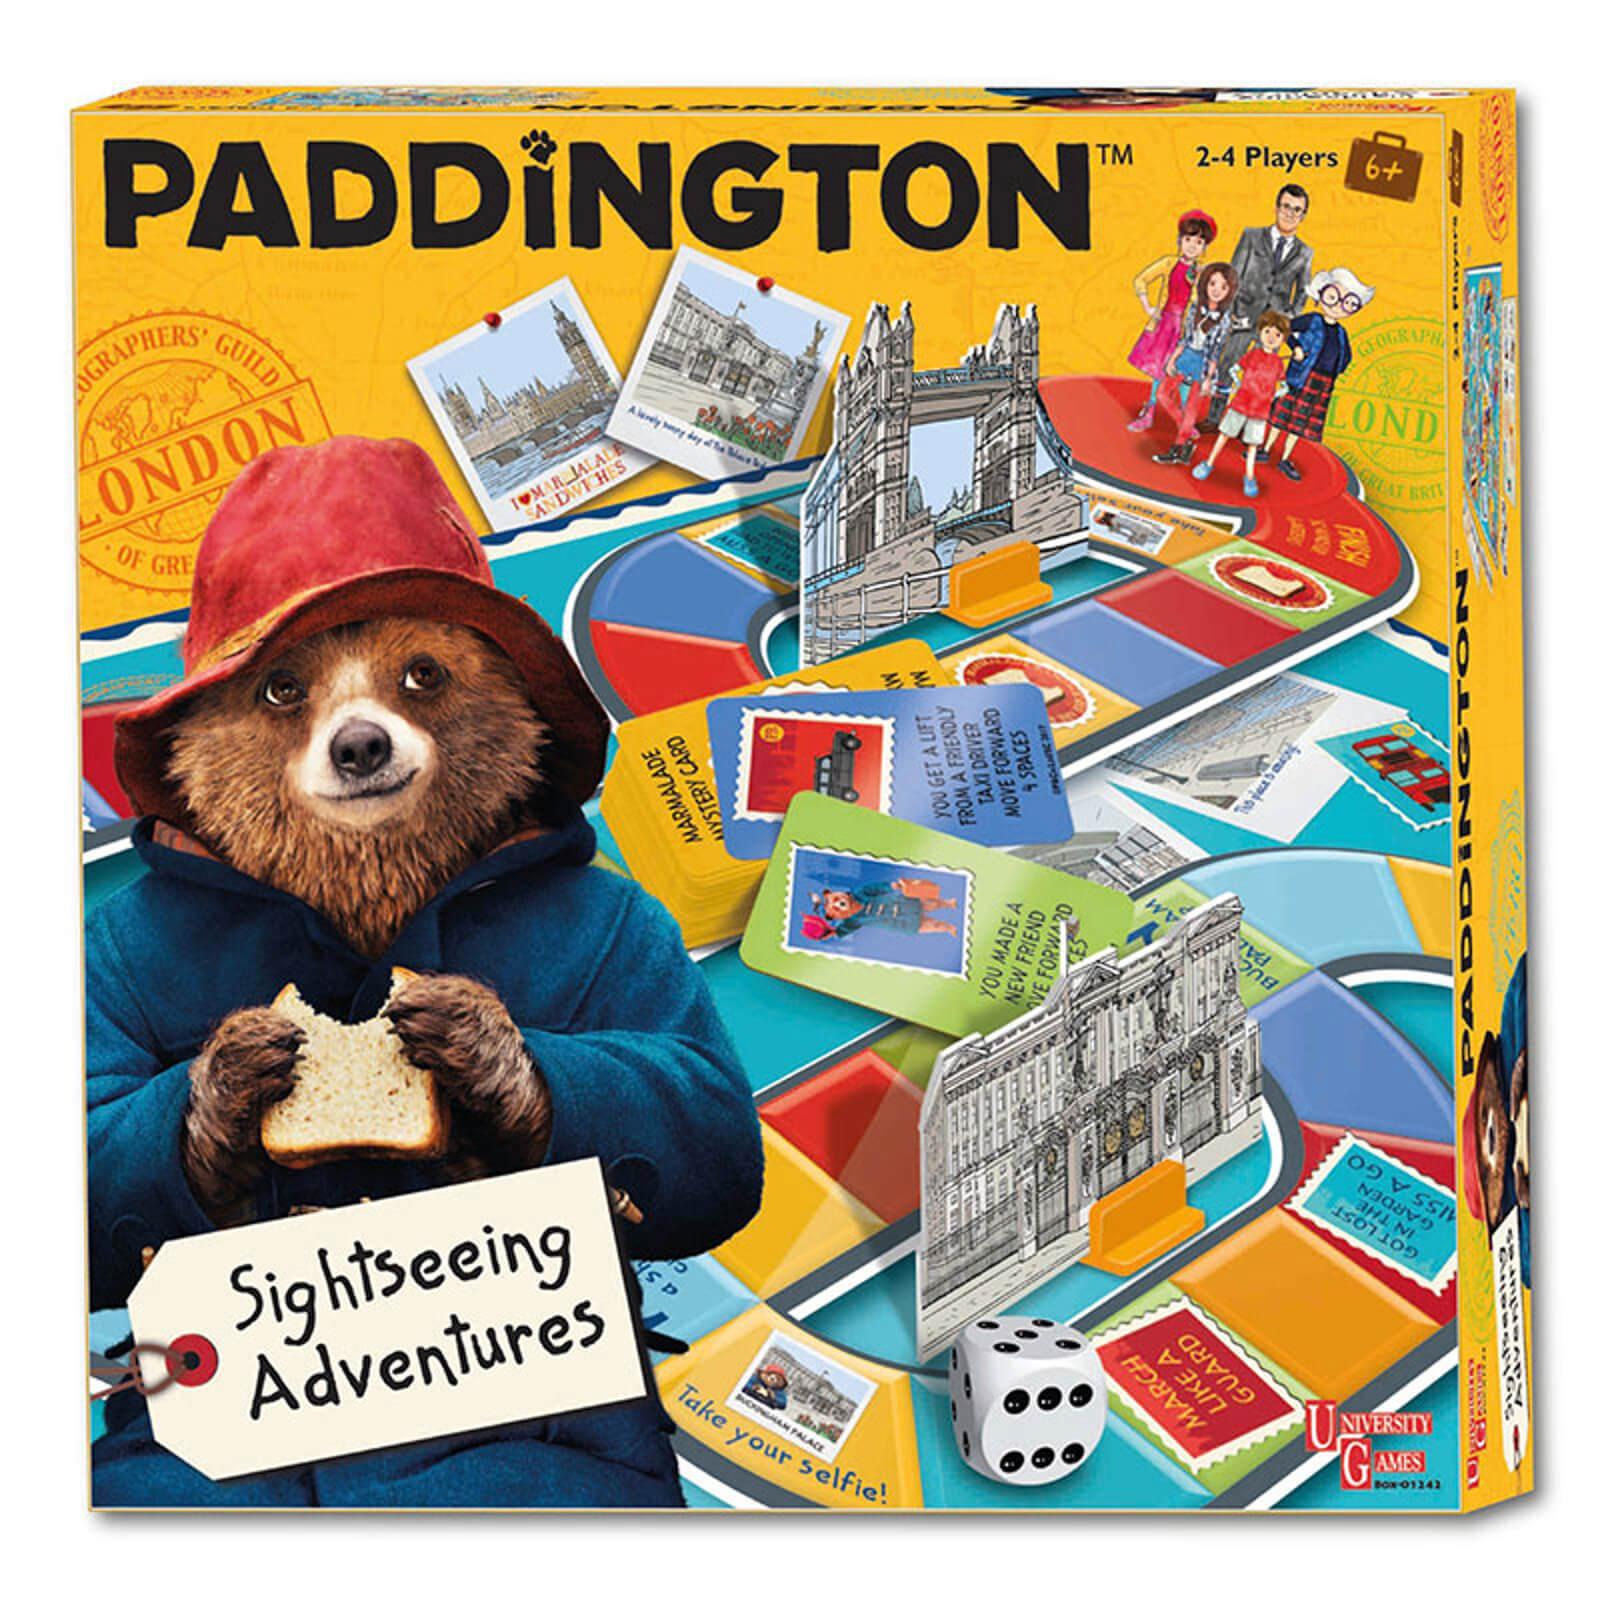 Image of Paddington Board Game